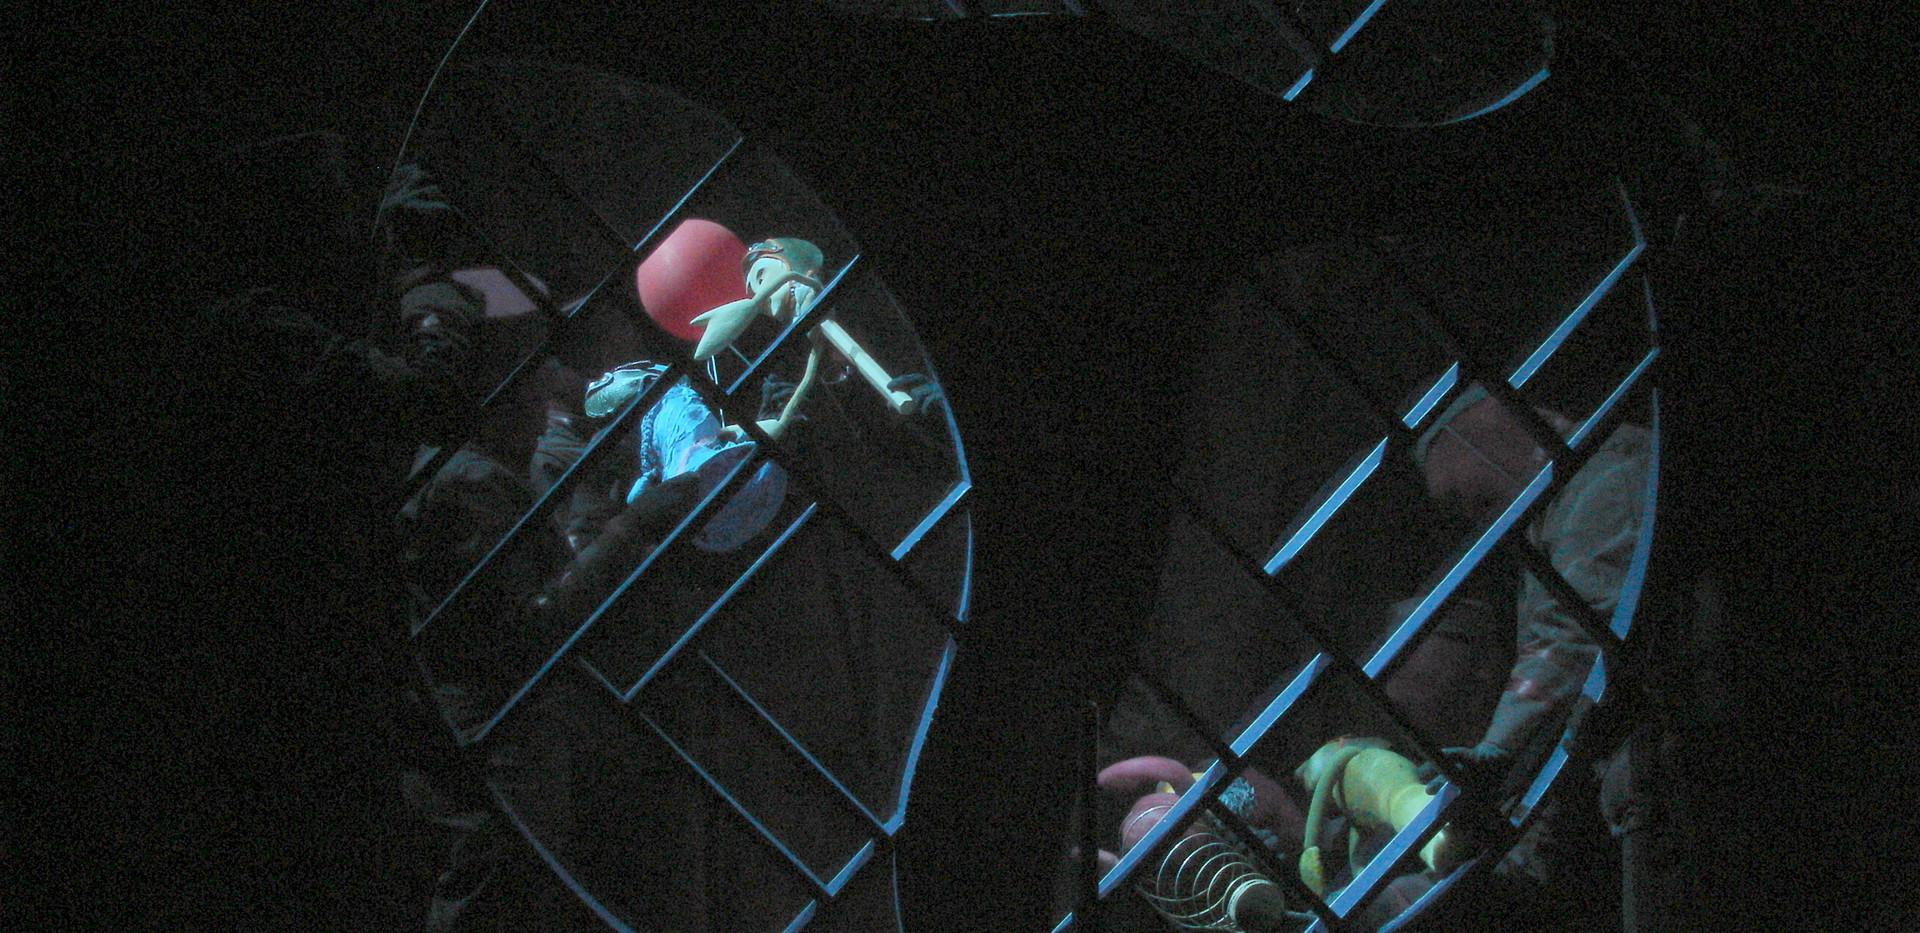 Balloon Roof Garden